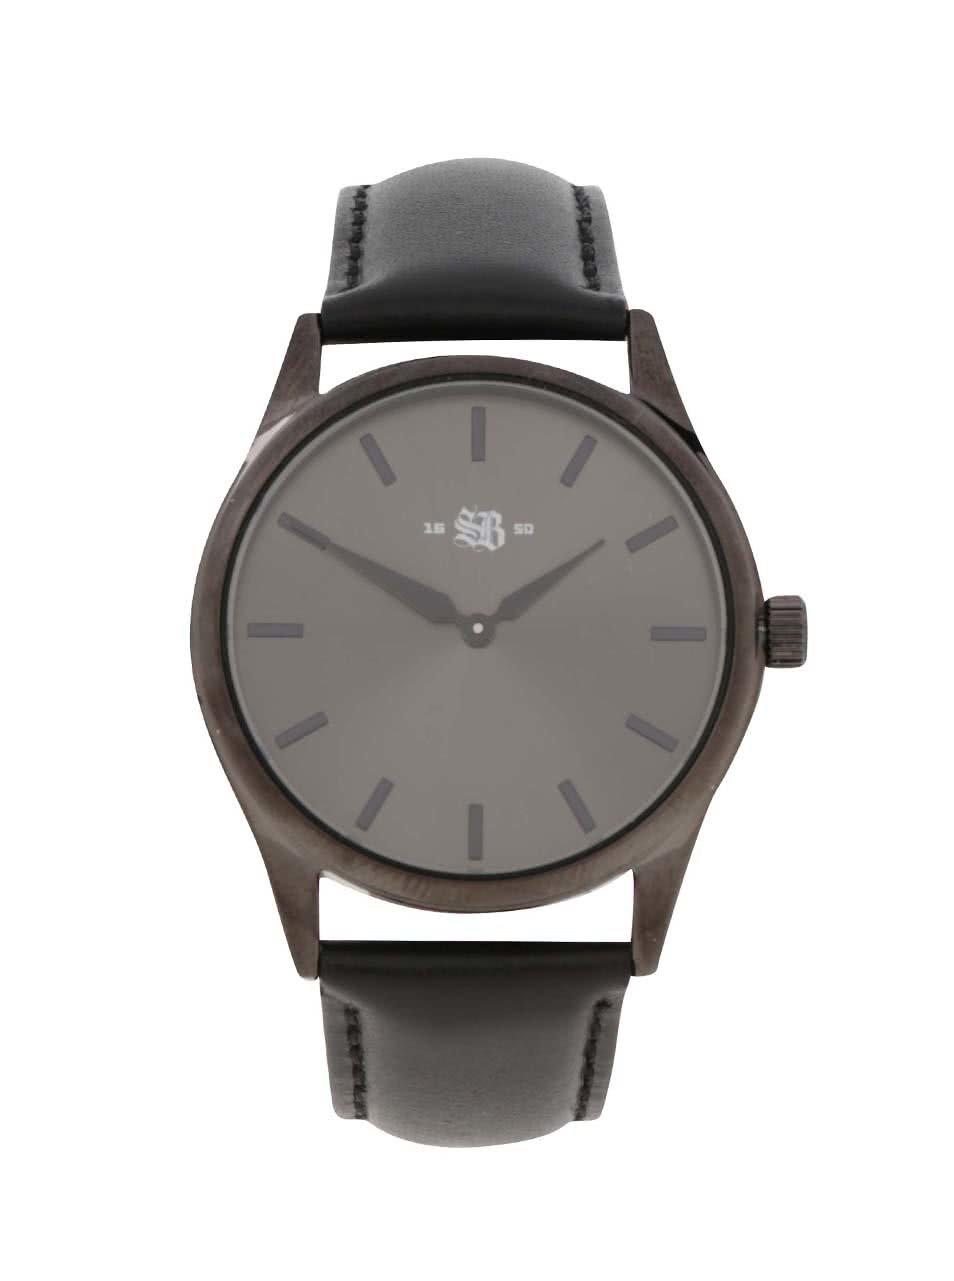 Černé pánské hodinky s koženým páskem CHPO SB 1650